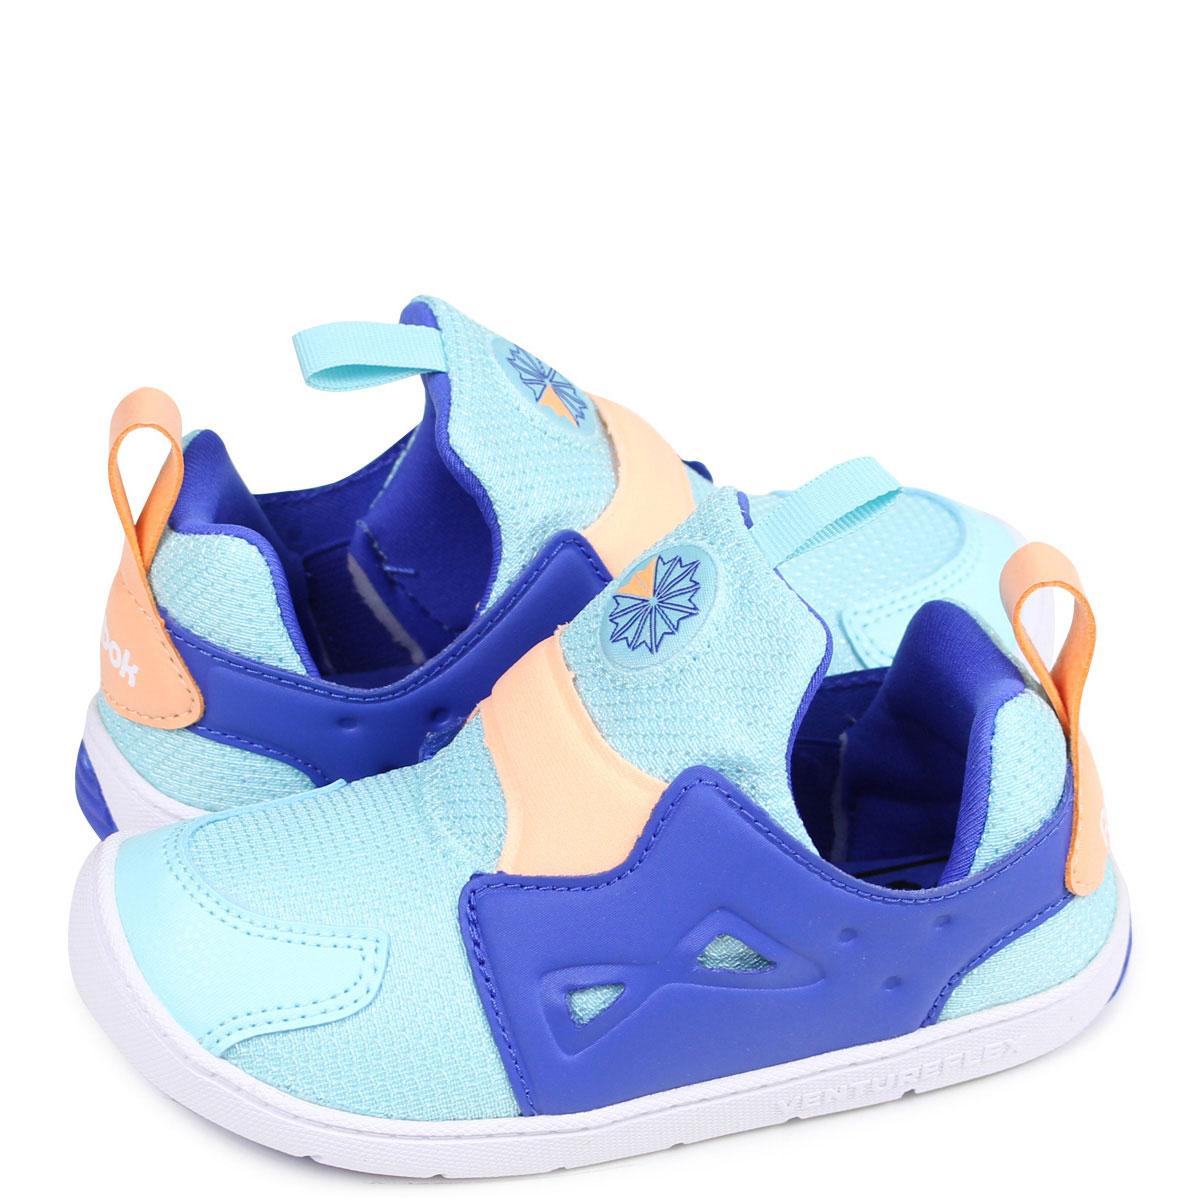 ALLSPORTS  Reebok VENTURE FLEX 2.0 Reebok venture flextime baby sneakers  slip-ons CM9145 blue  1801   ec653715b